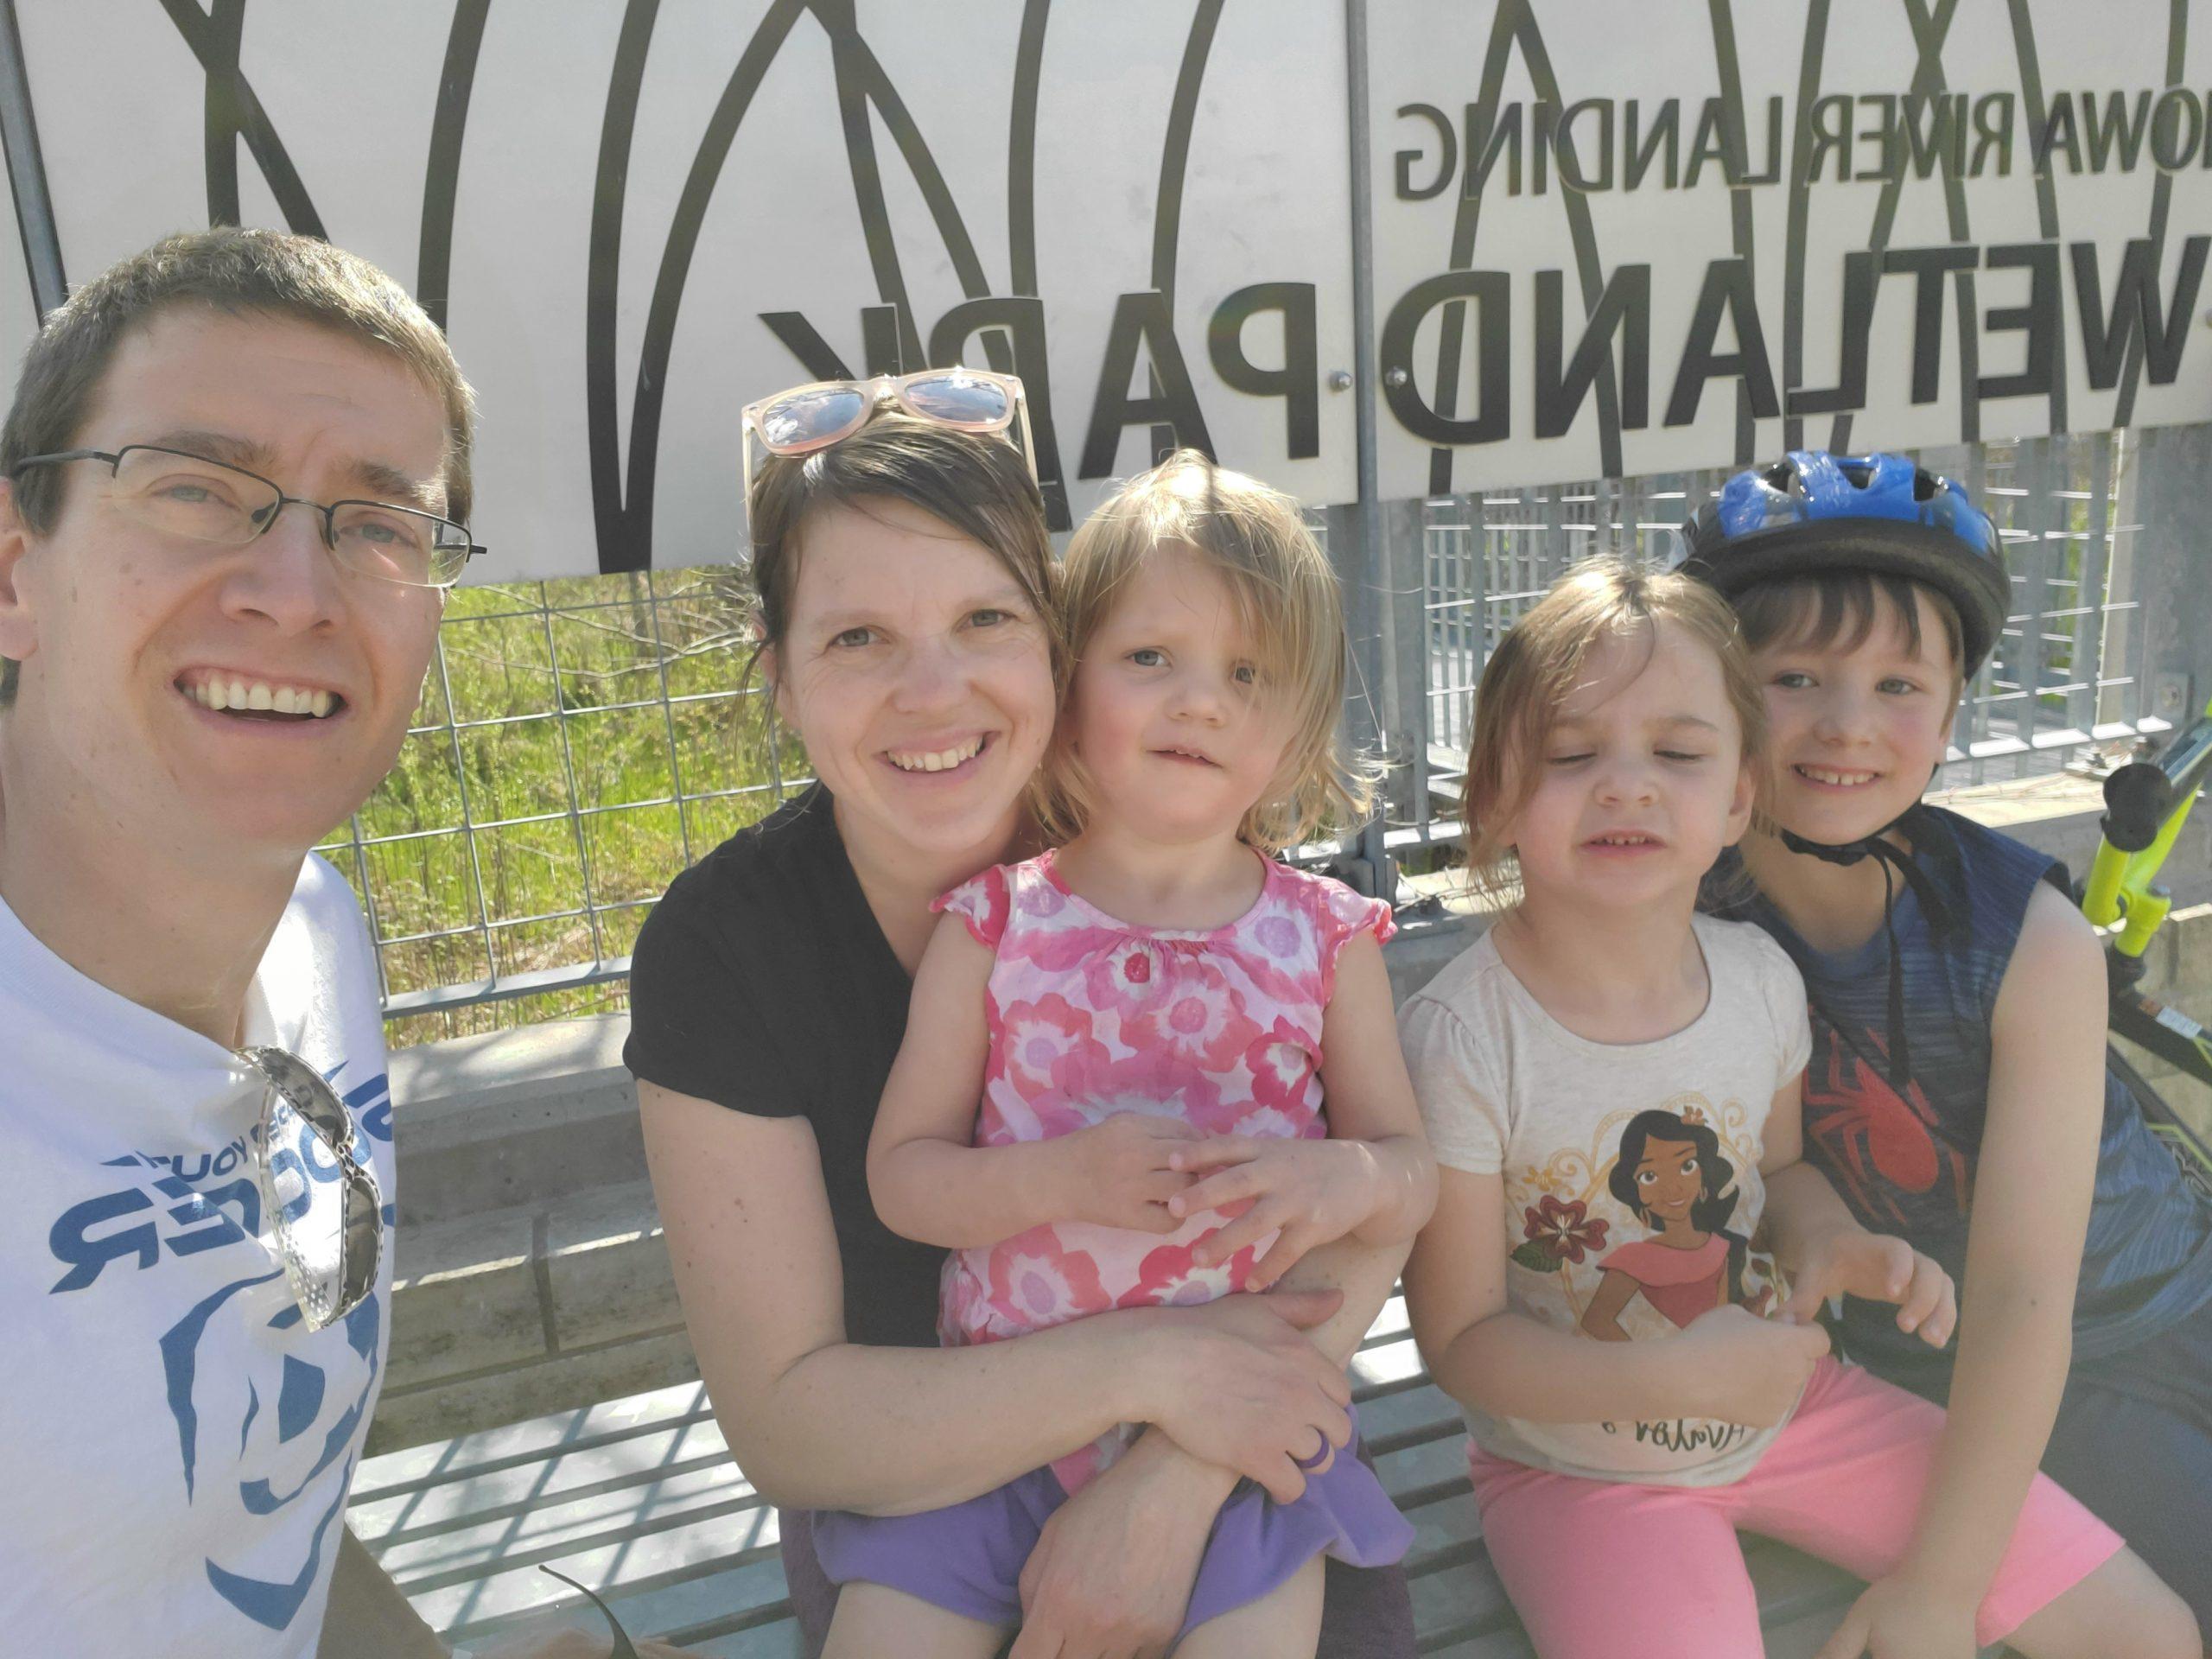 A family enjoying a socially distant walk